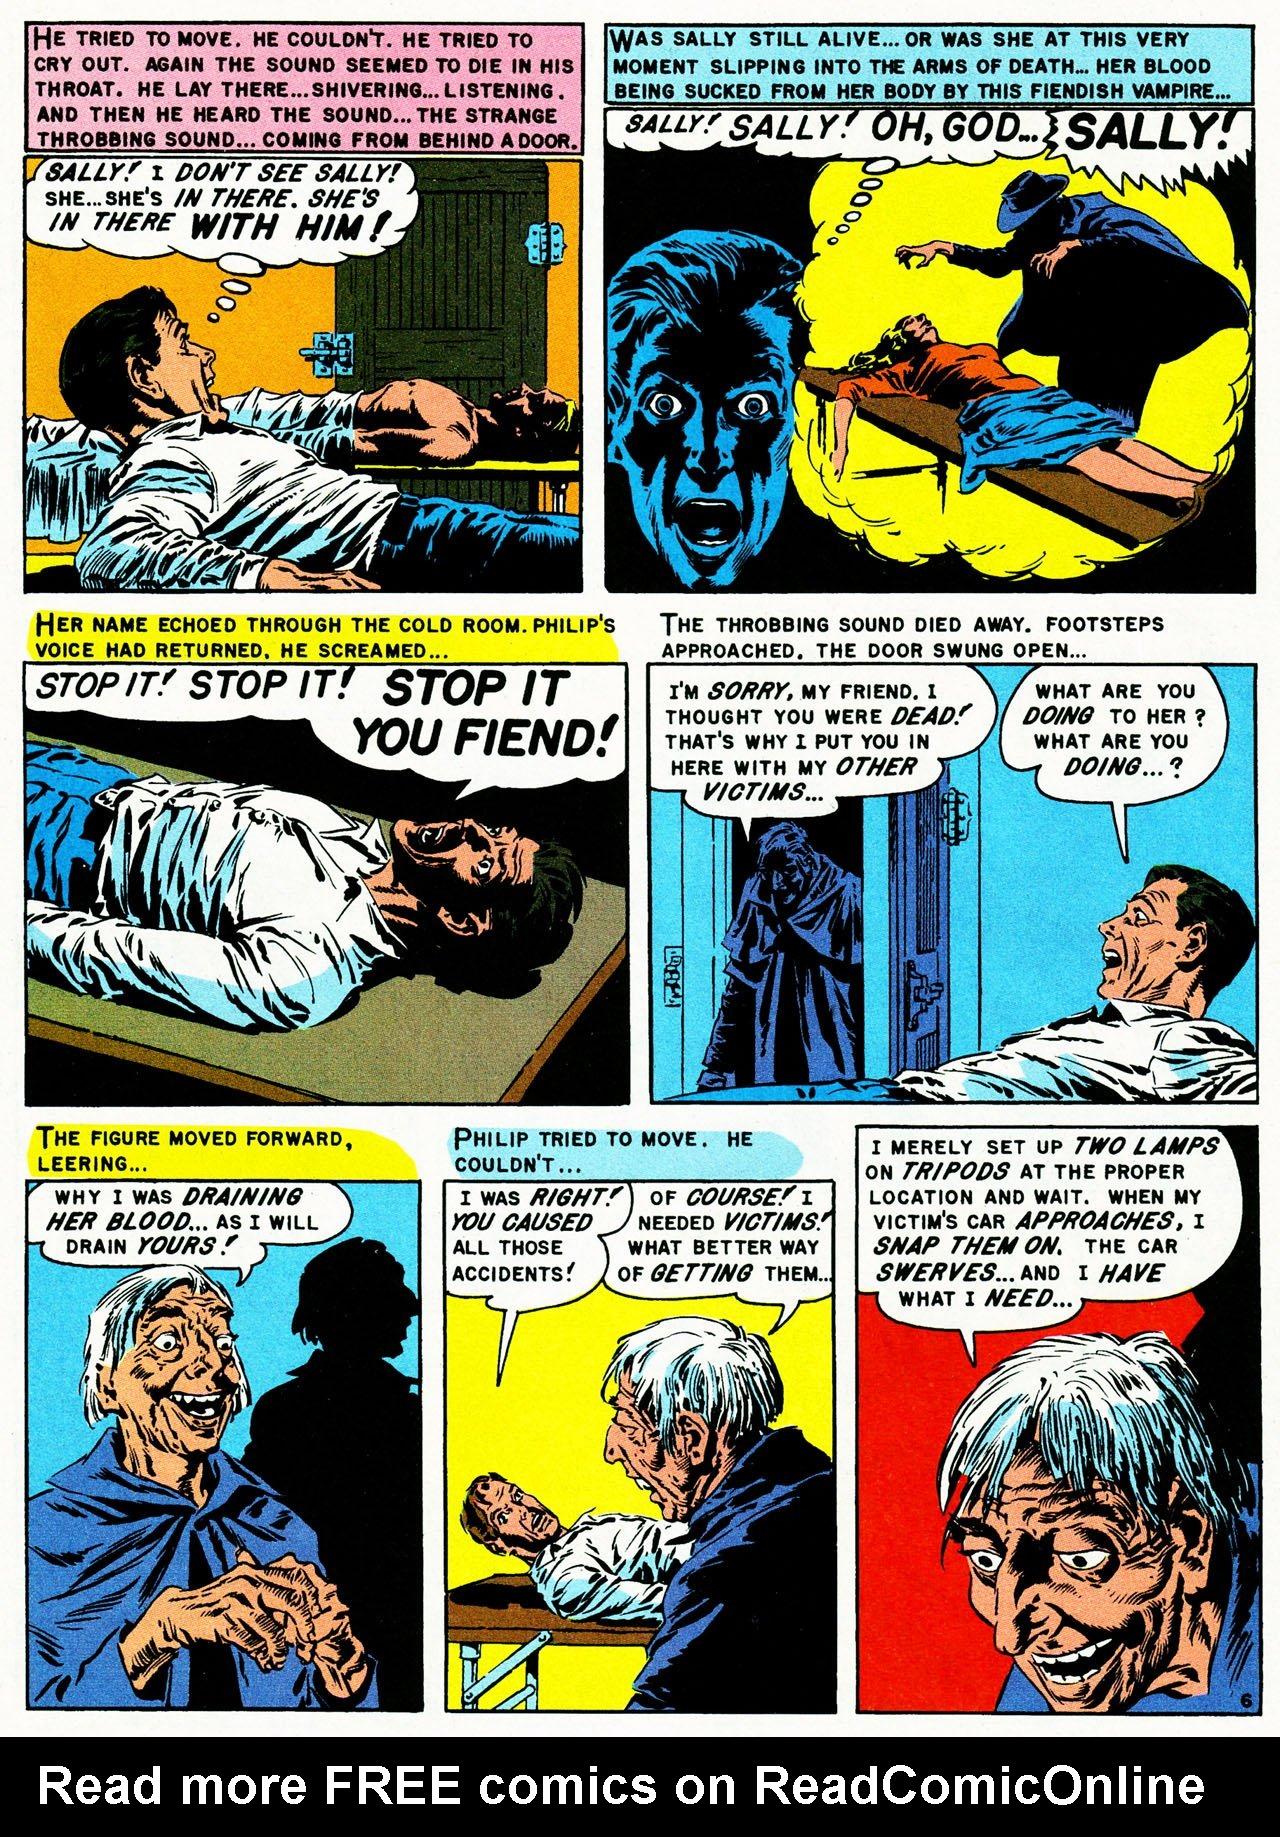 Read online Shock SuspenStories comic -  Issue #10 - 32